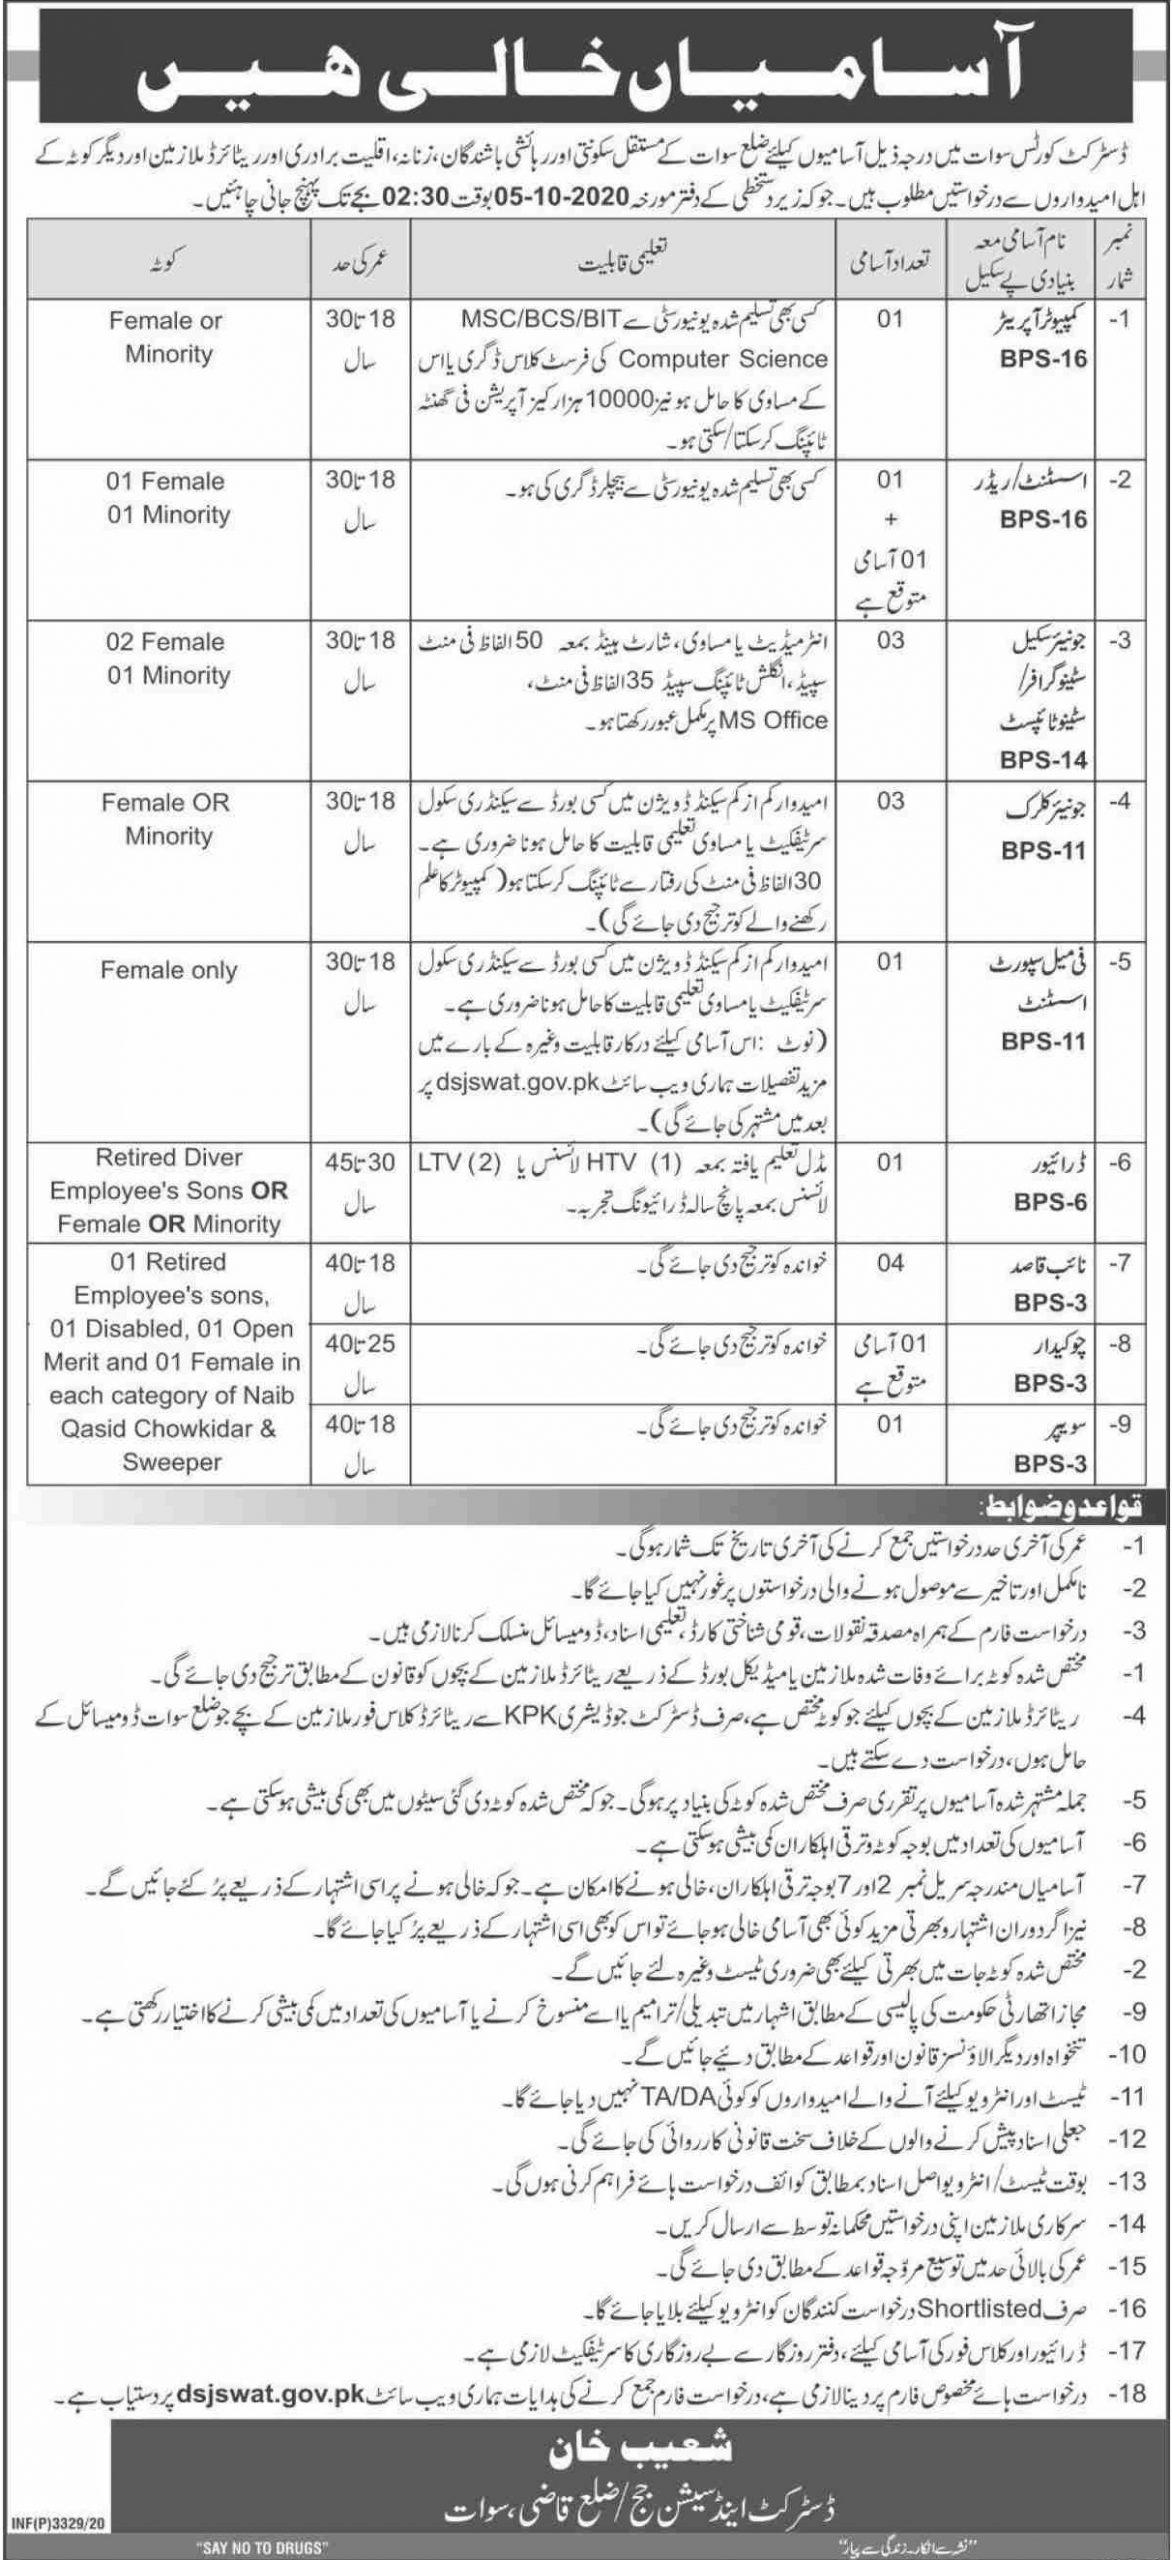 District Courts Swat Jobs September 2020 KPK